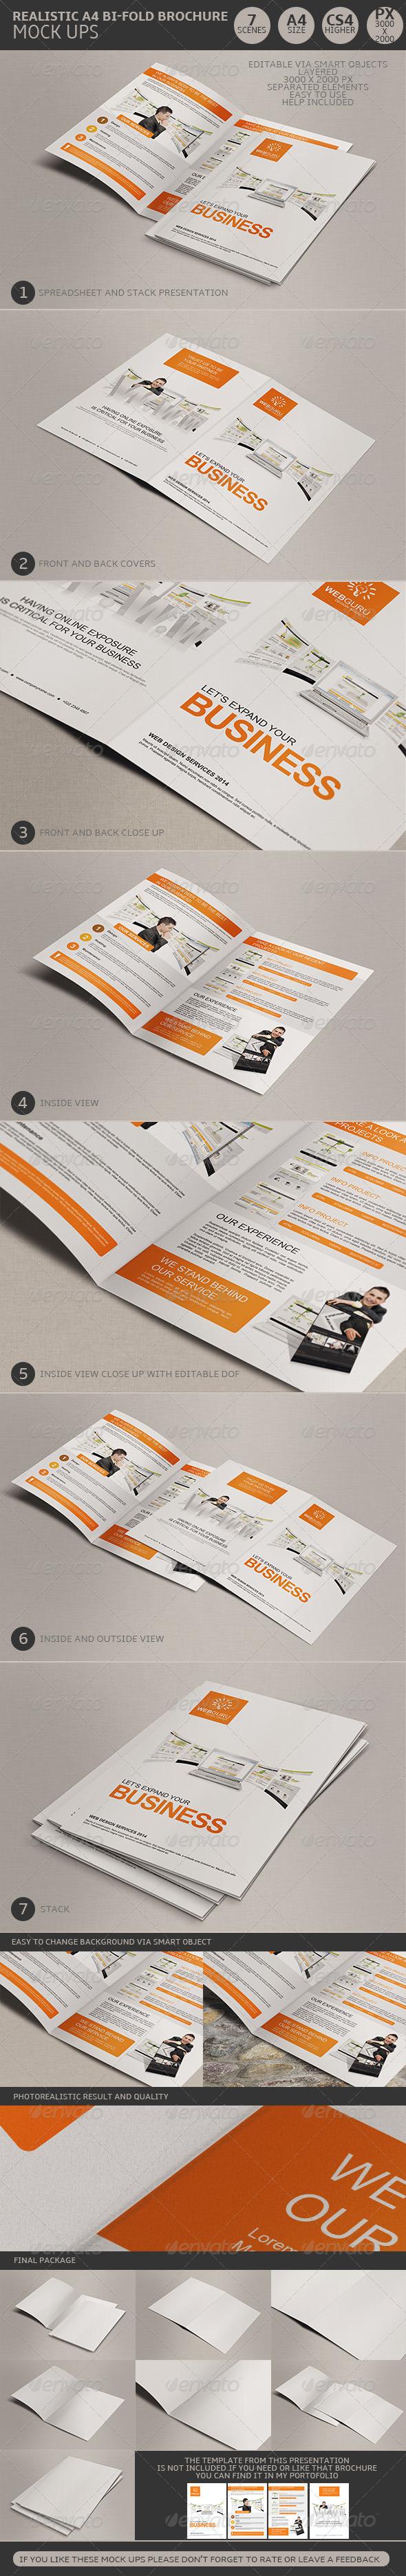 GraphicRiver Realistic A4 Bi Fold Brochure Mock Ups 8256688